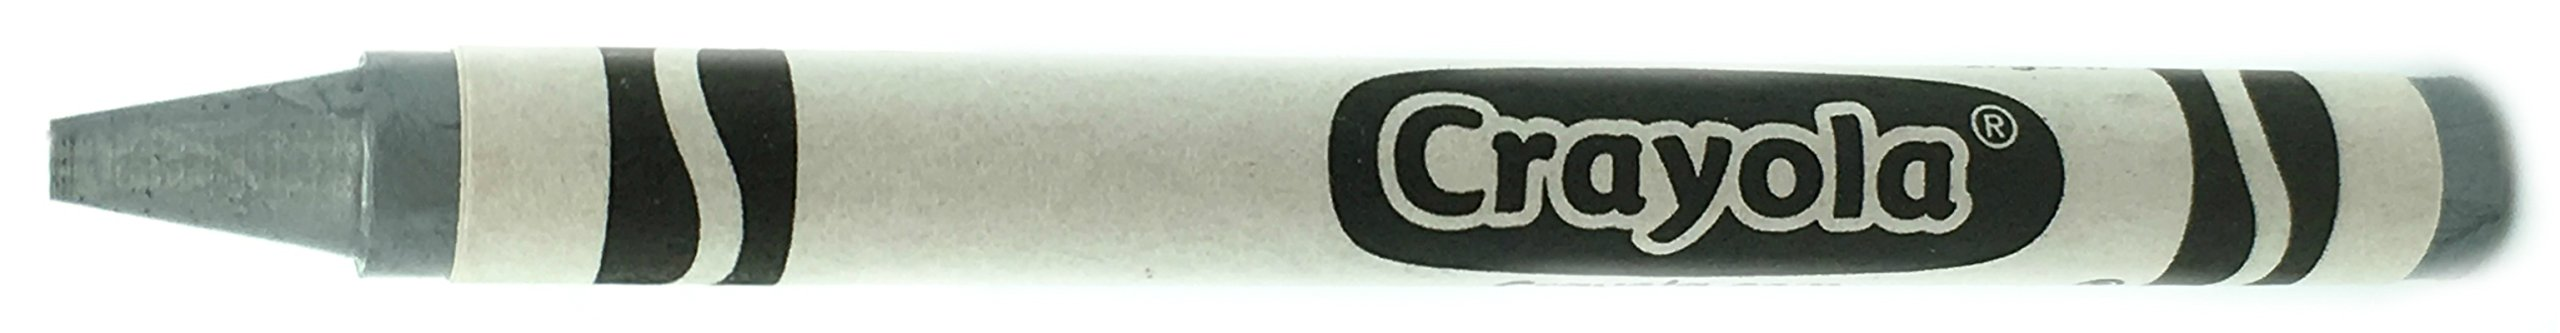 50 Silver Crayons Bulk - Single Color Crayon Refill - Regular Size 5/16'' x 3-5/8''